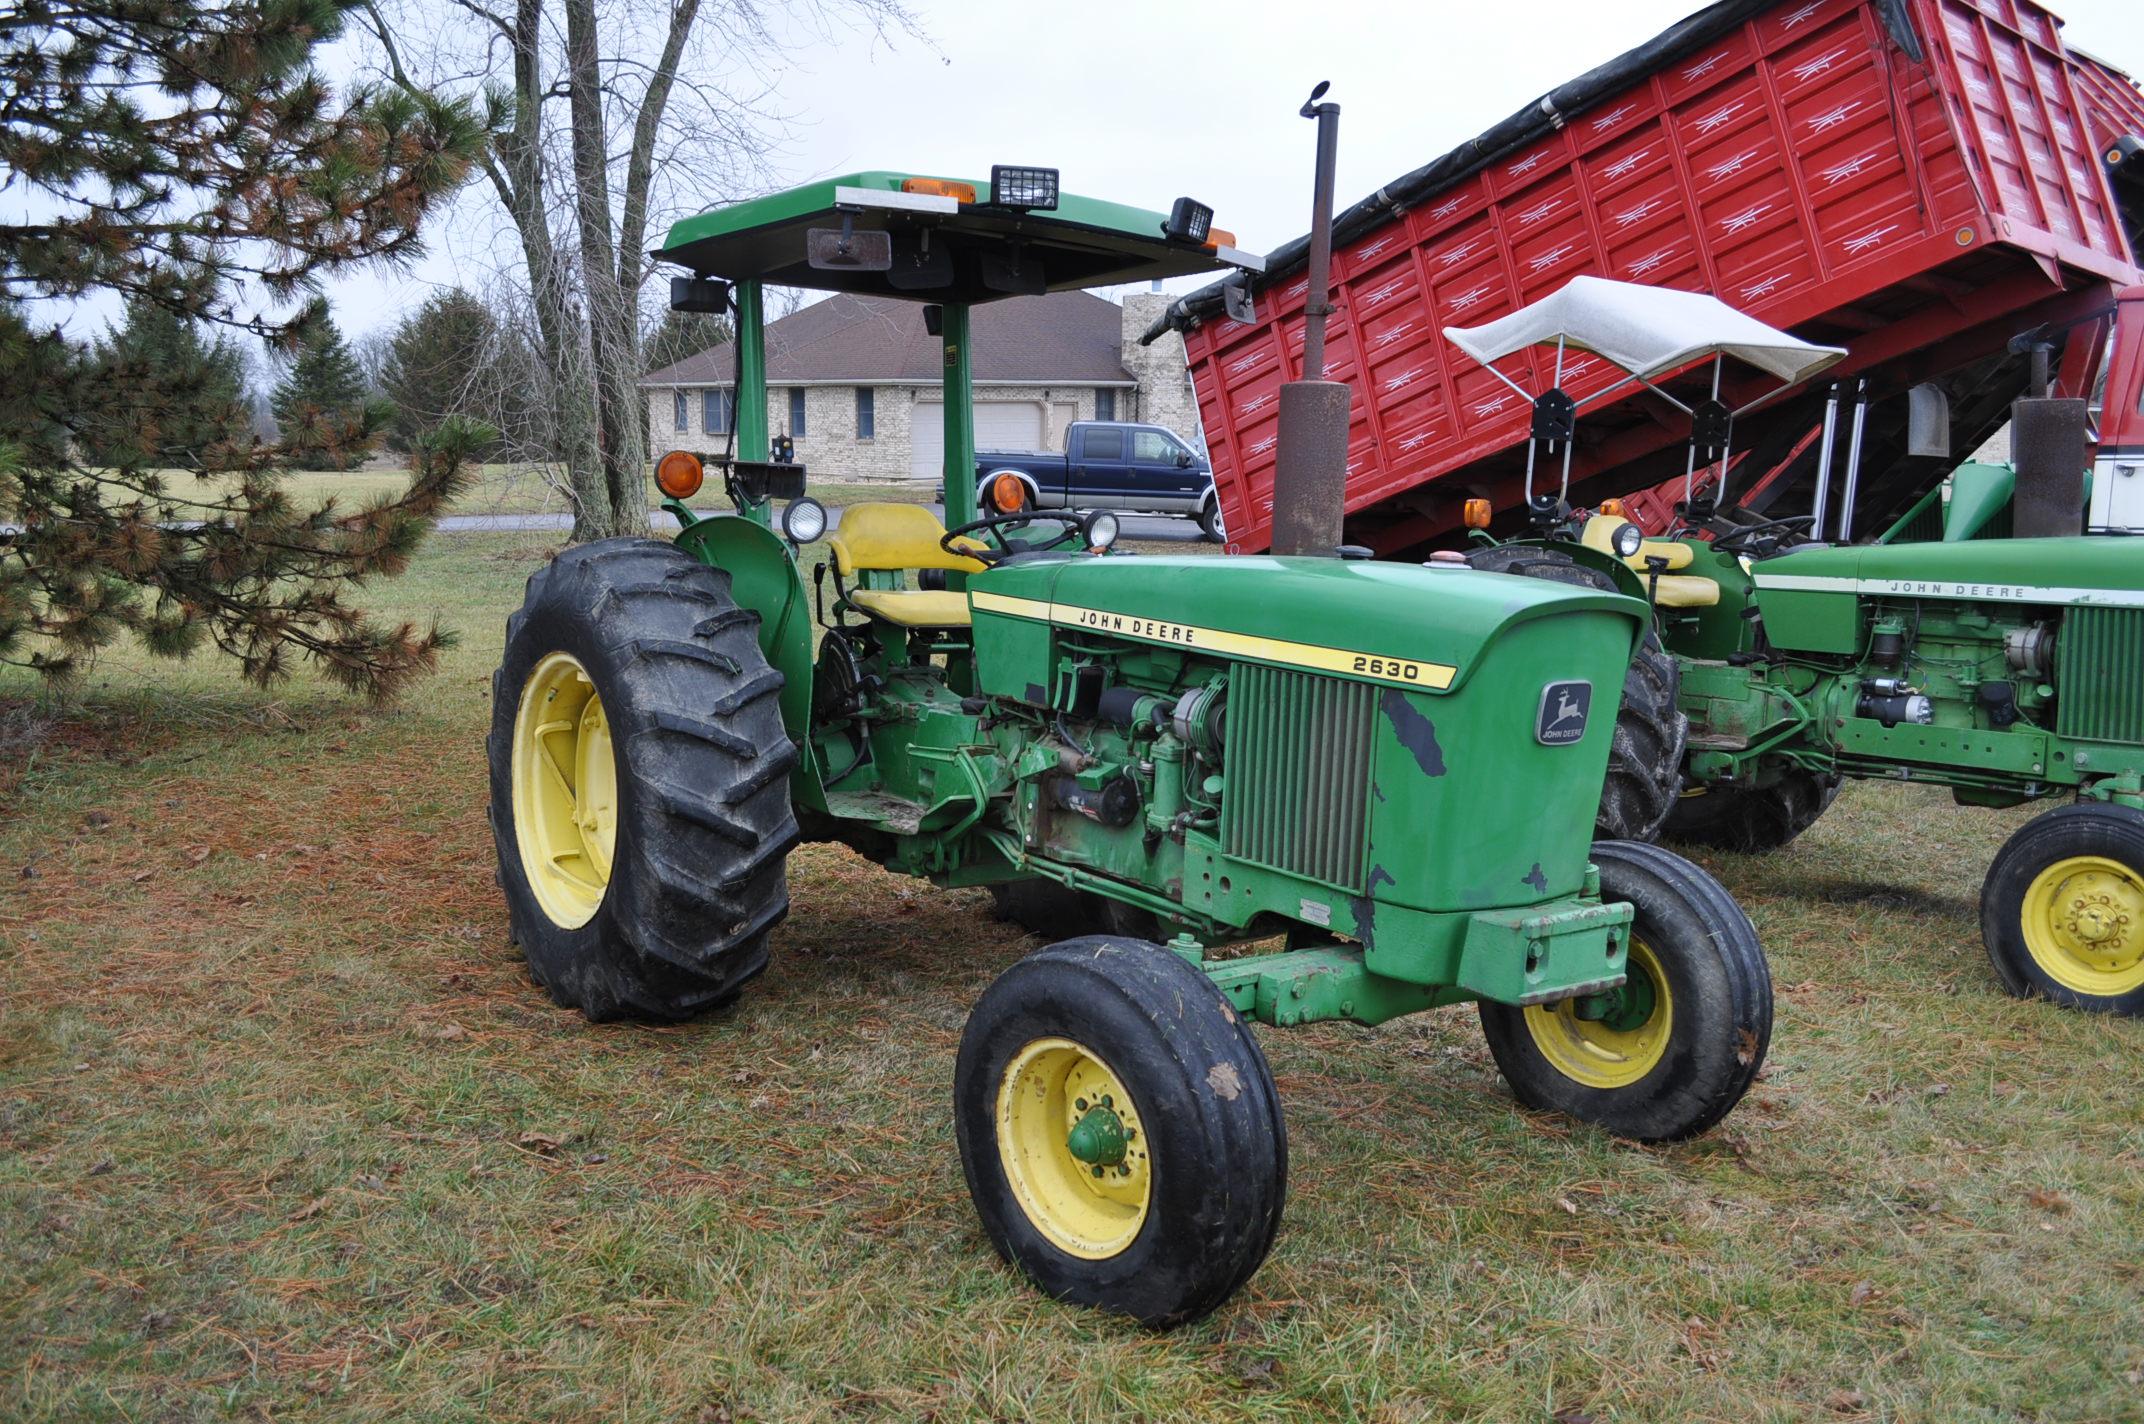 John Deere 2630 tractor, diesel, 16.9-28 rear, 9.5-15 front, 1 hyd remote, 540 pto, 3 pt, 4260 - Image 4 of 18